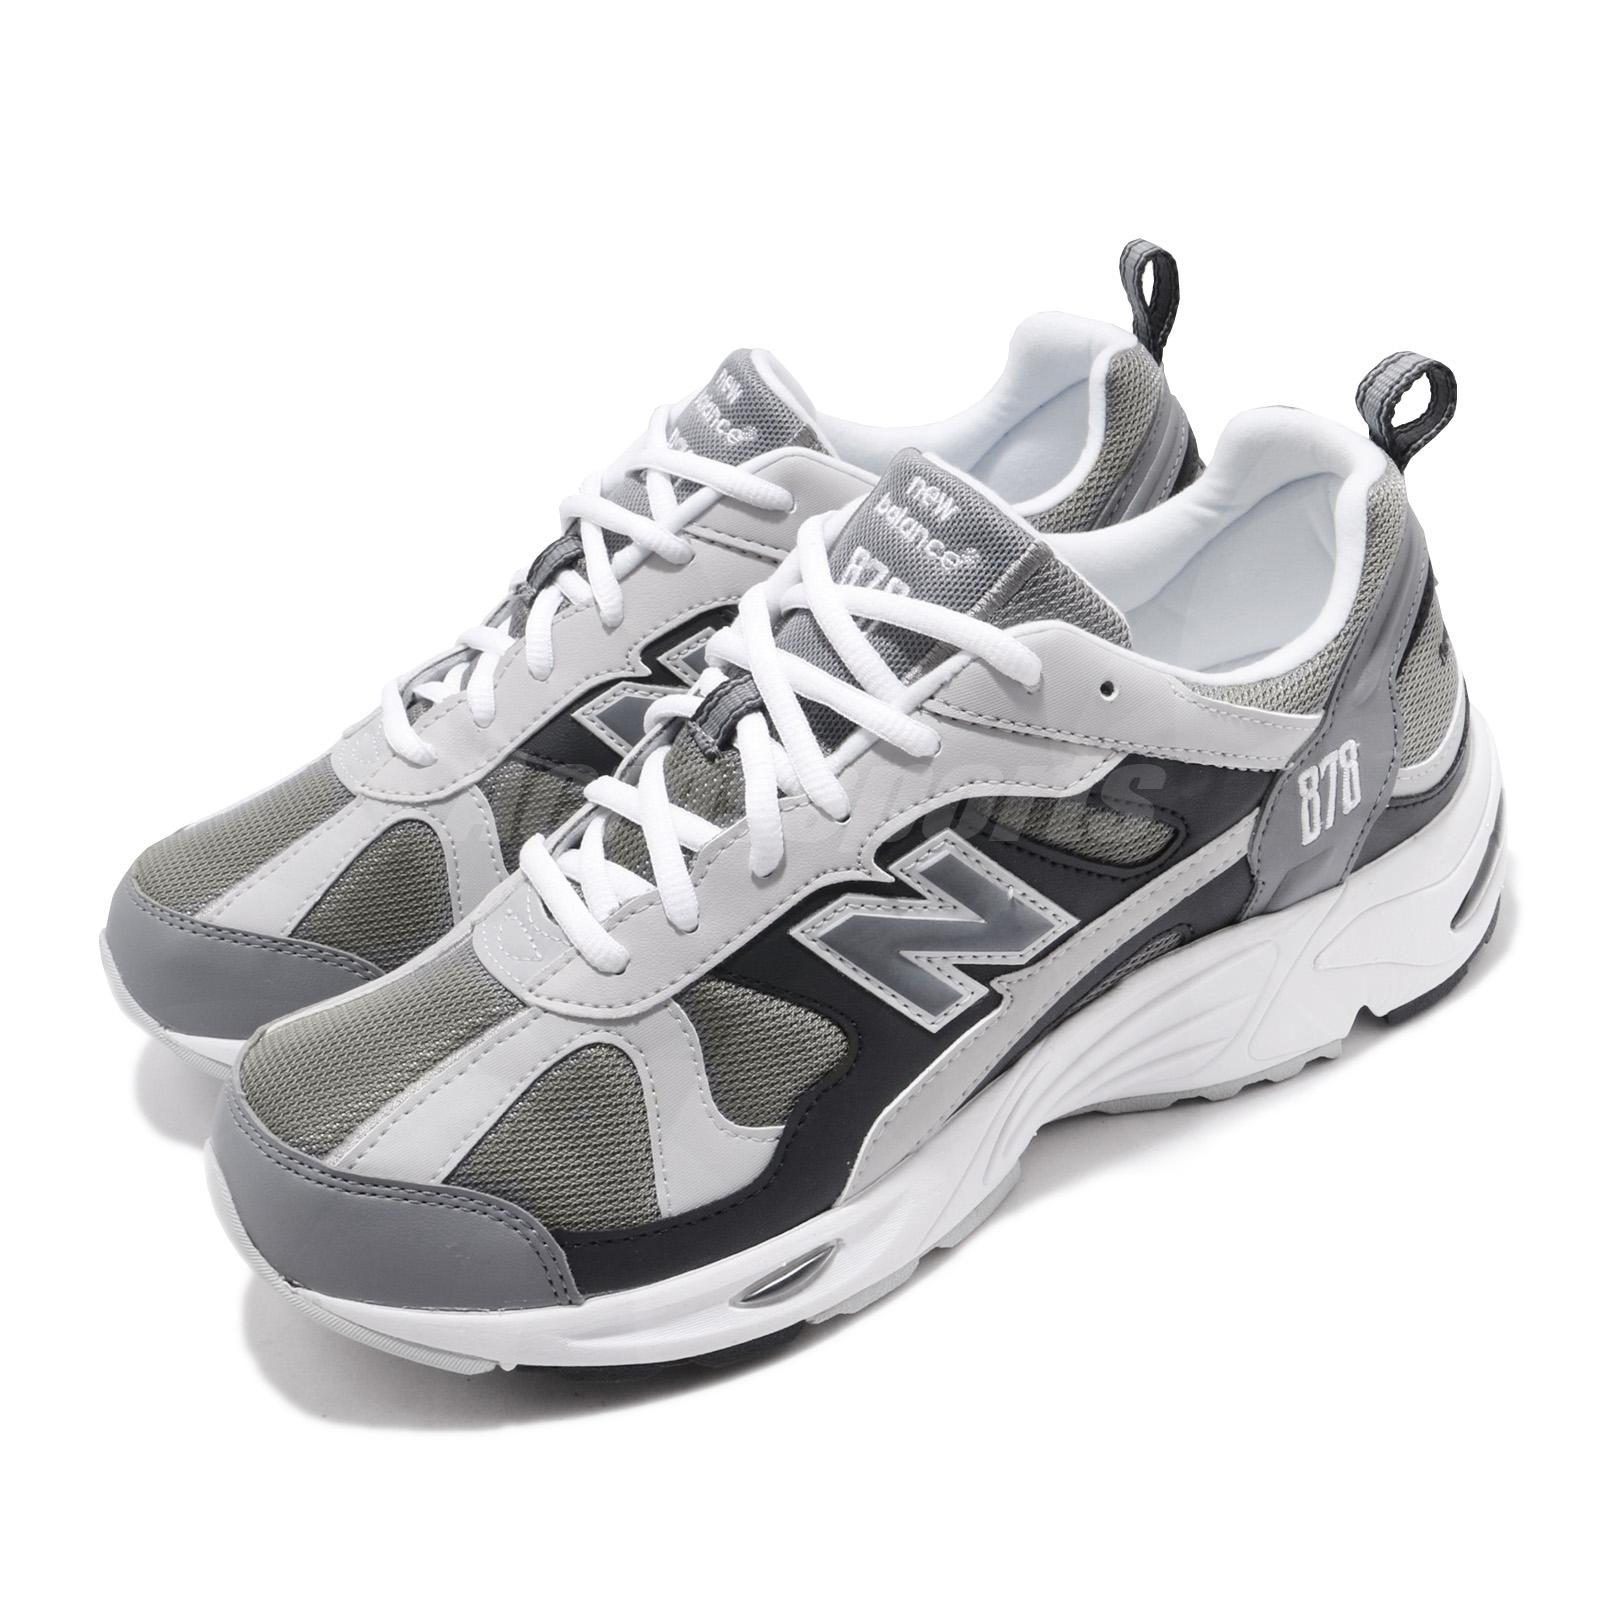 New Balance CM878GRY D Grey White Men